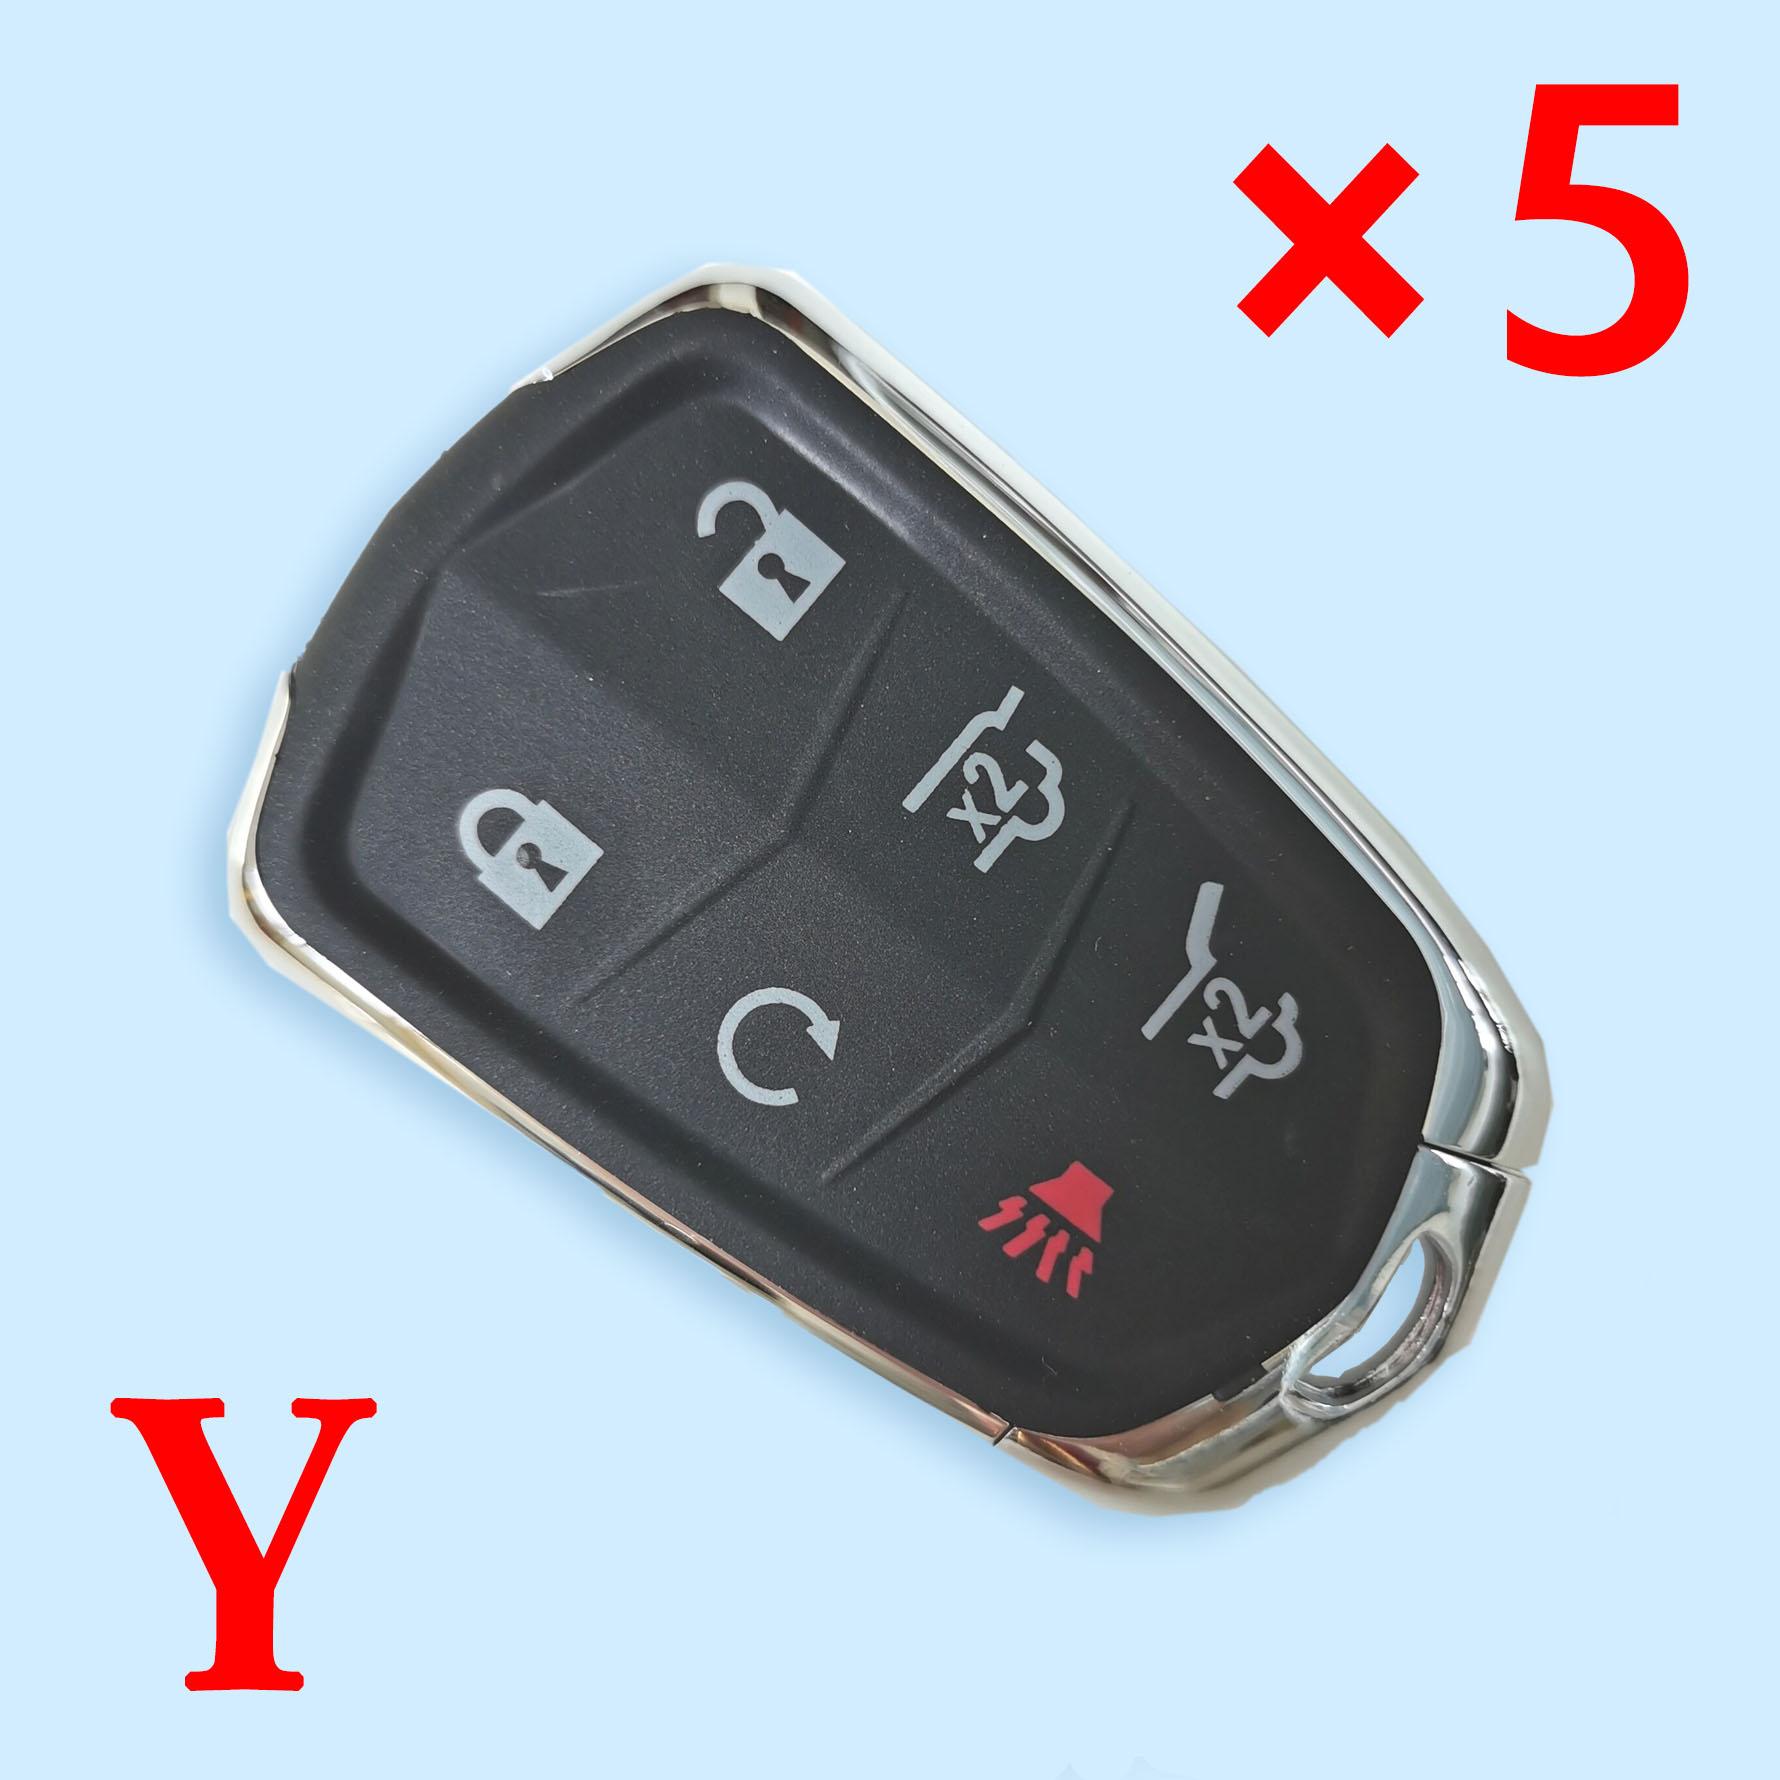 6 Buttons Remote Key Case Fob Shell With Blade #13580794 for Cadillac Escalade/Escalade ESV 2015 2016 2017 2018  5pcs